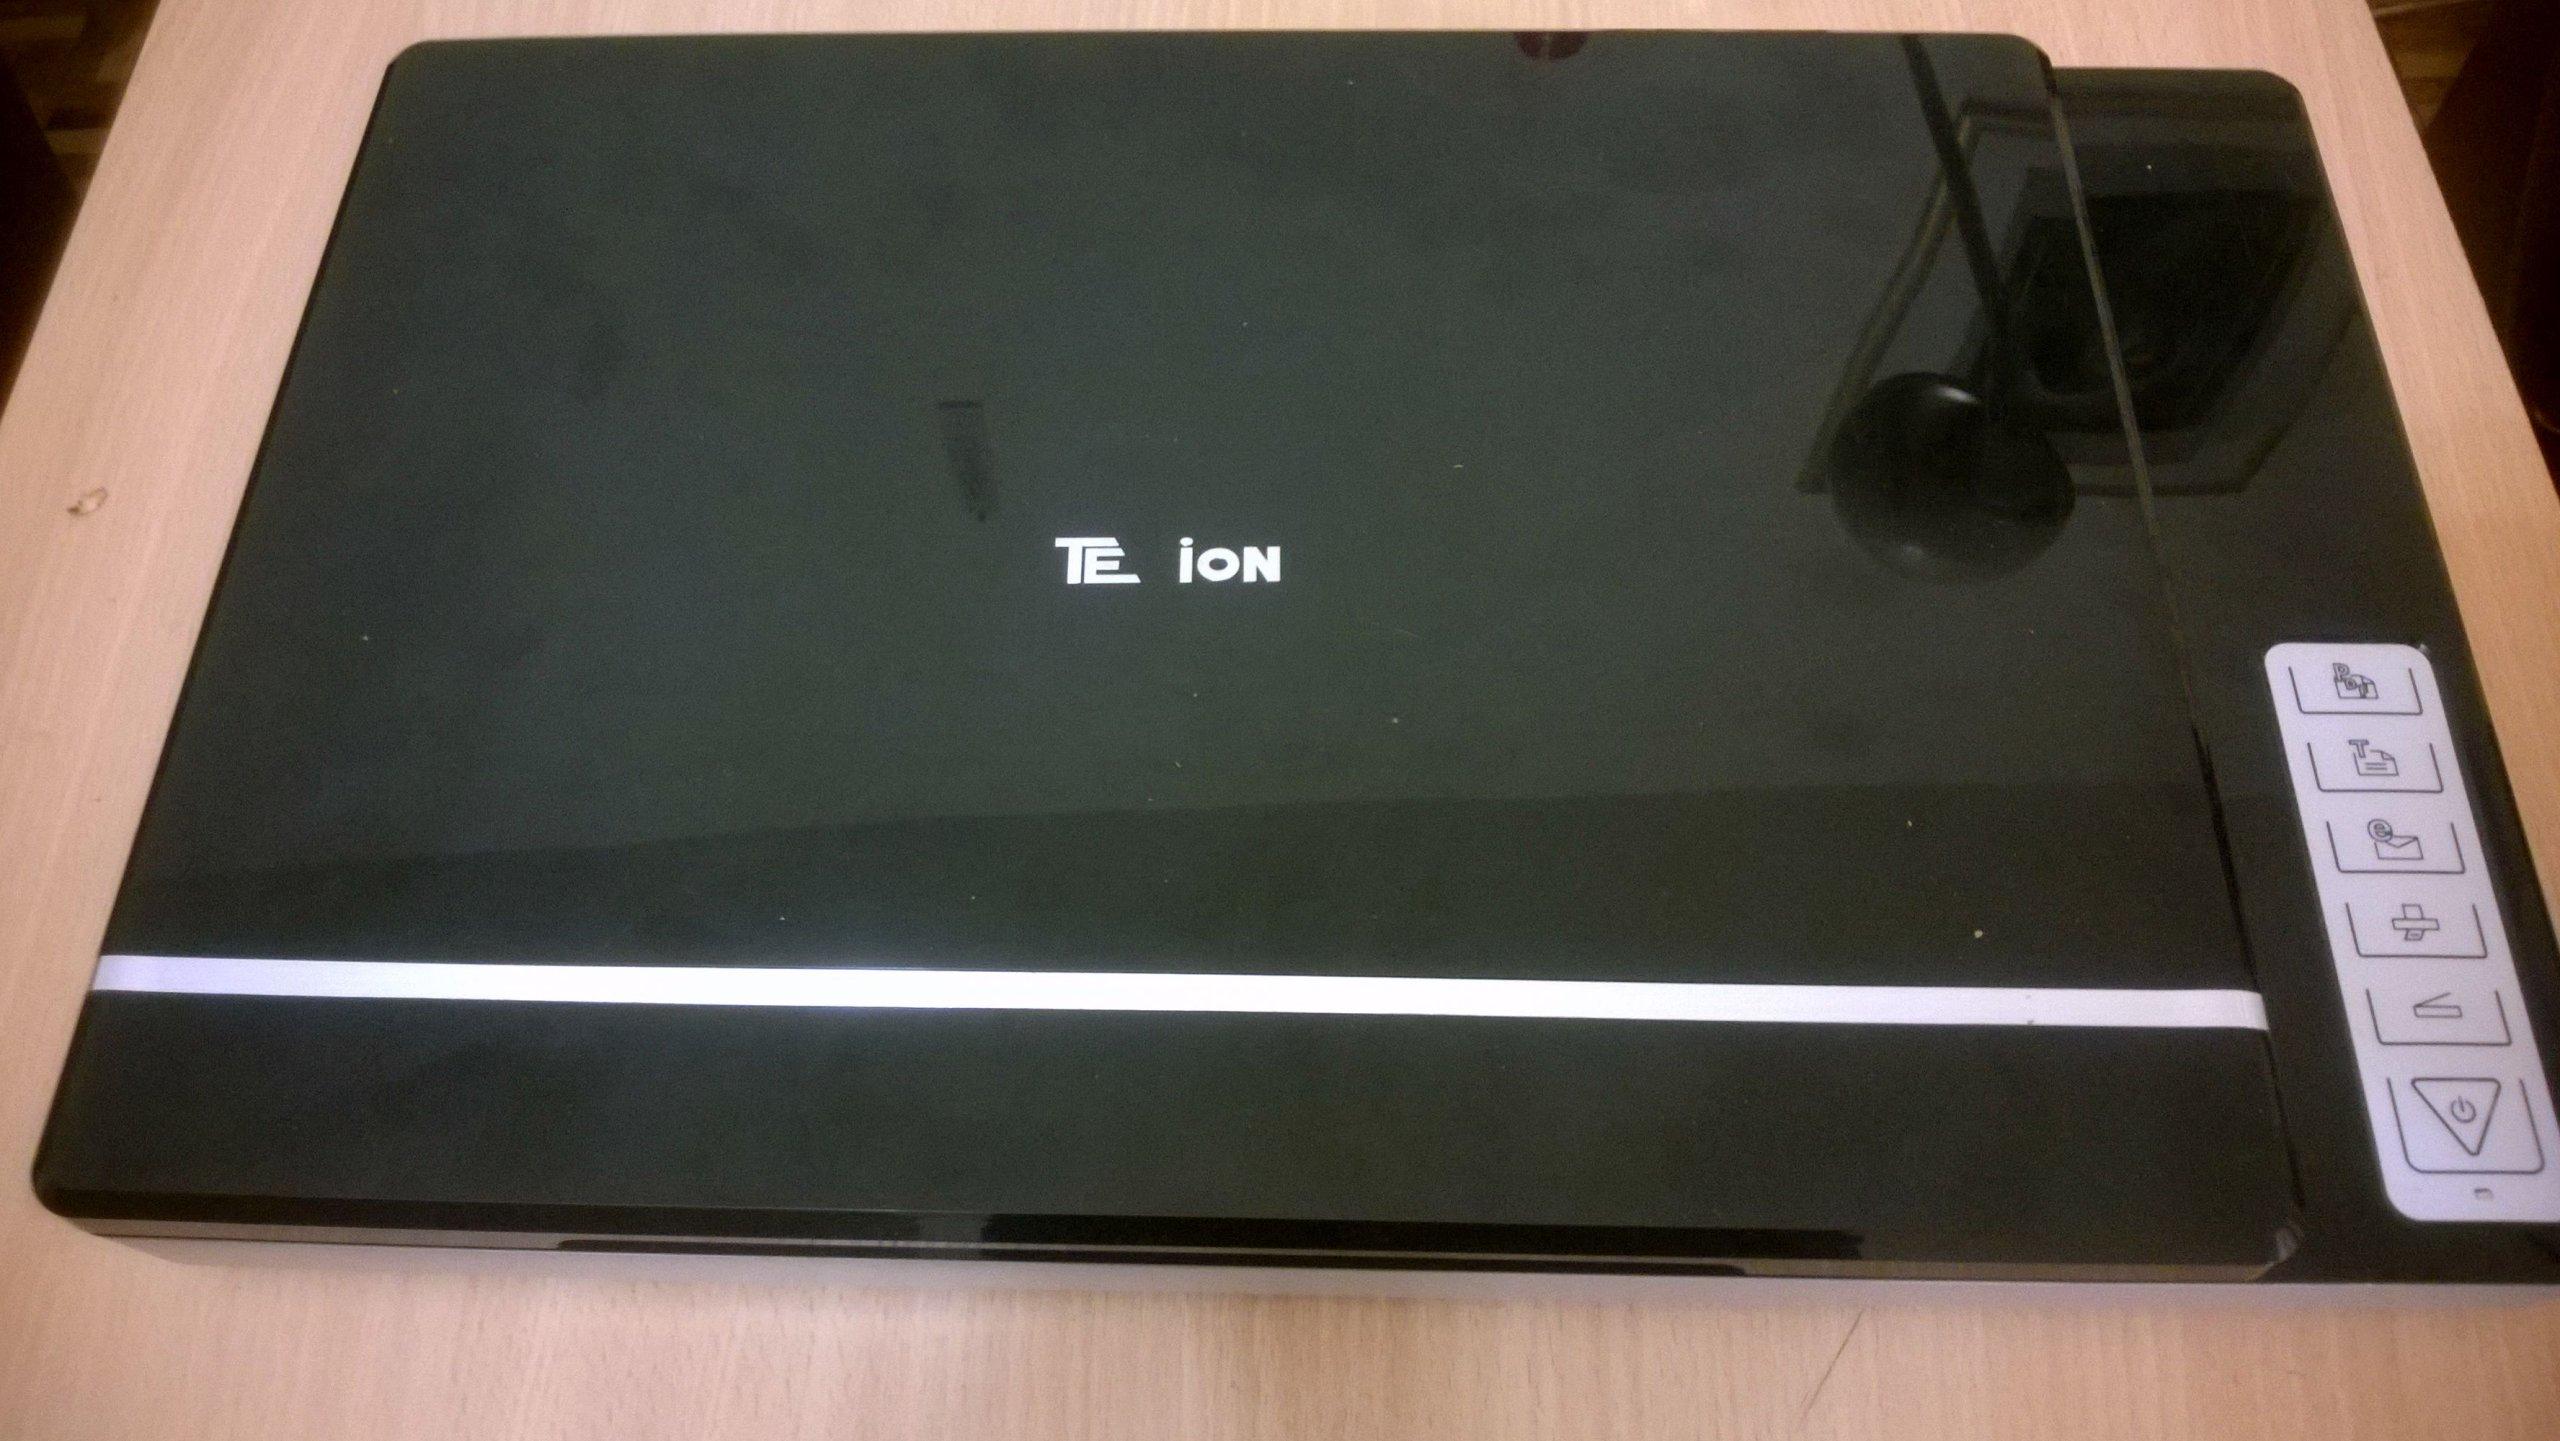 Skaner Medion/Tevion/Microtec 4800x9600dpi.